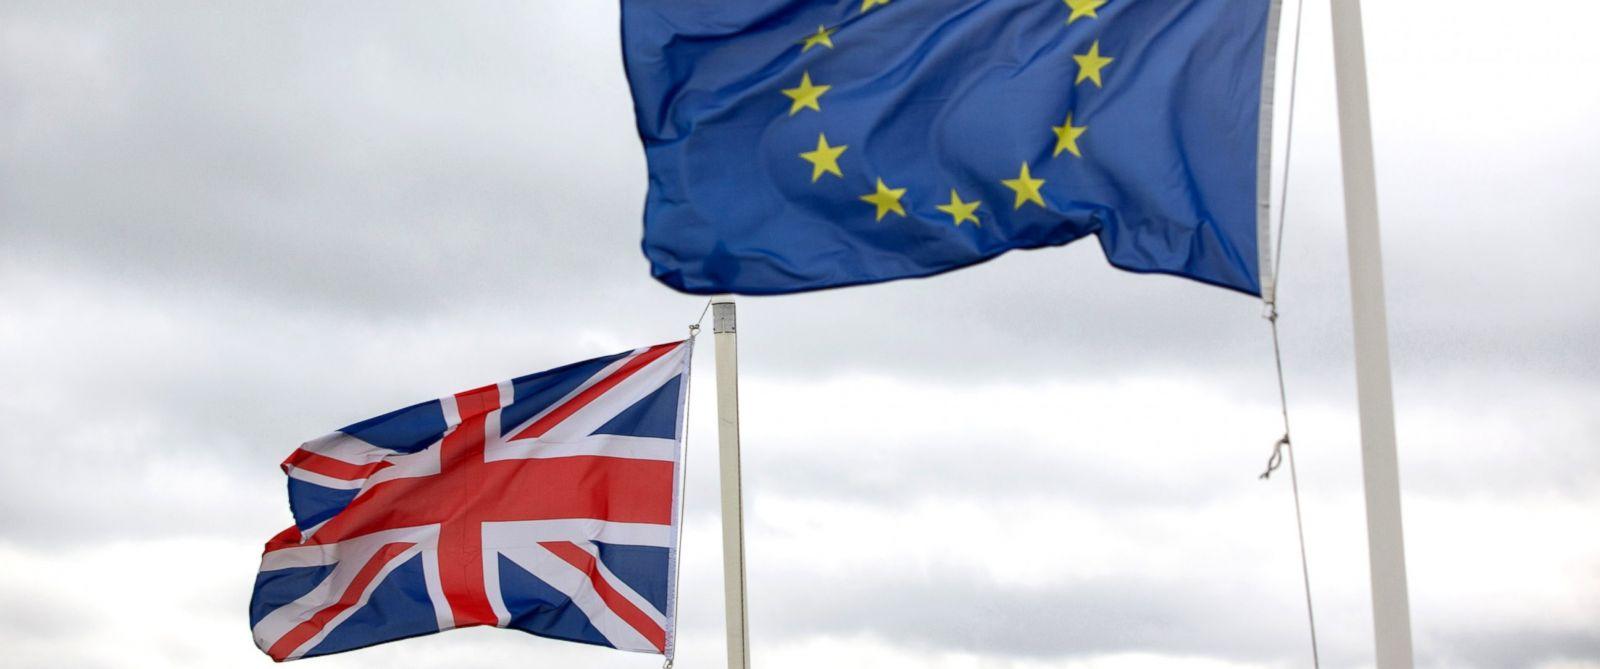 PHOTO: A British Union flag, commonly known as a Union Jack, left, flies next to the European Union (EU) flag, Feb. 23, 2016.